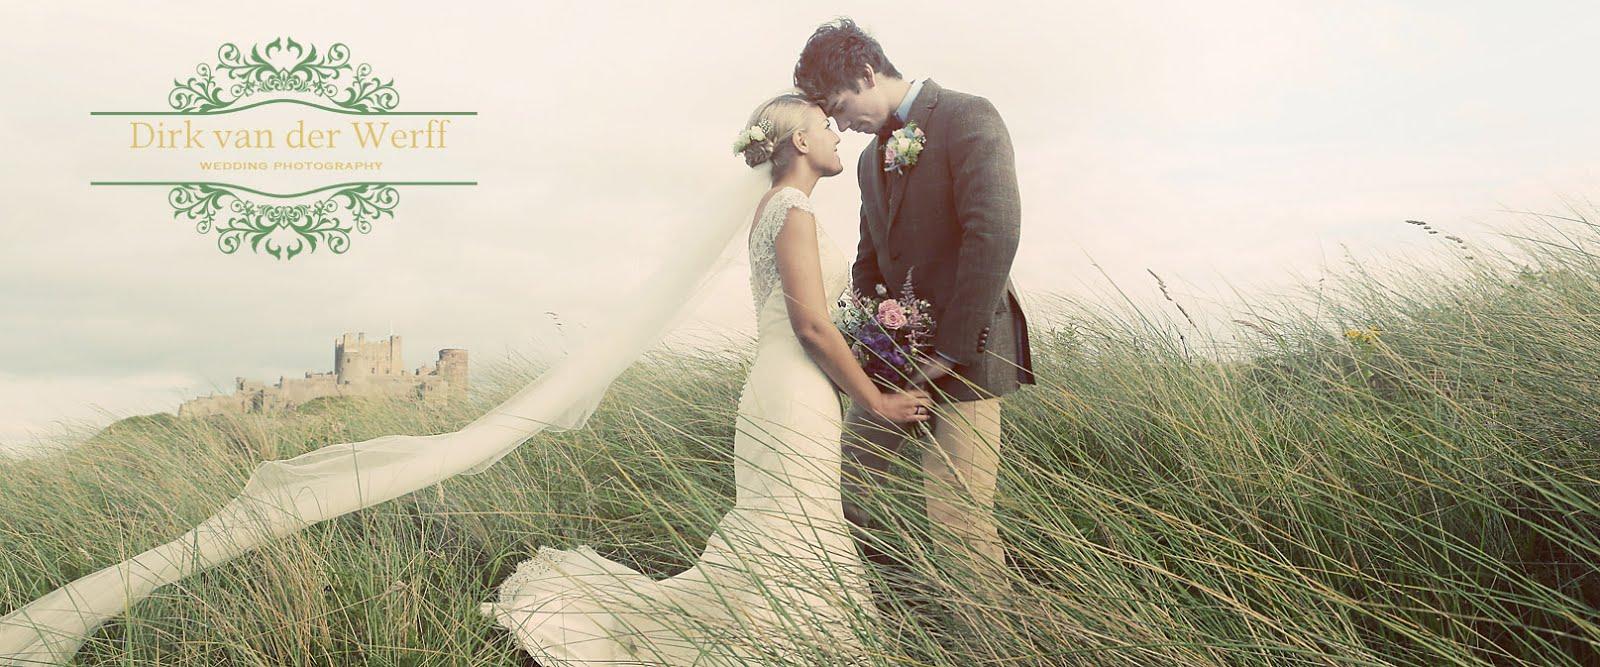 DIRK VAN DER WERFF  - WEDDING PHOTOGRAPHY